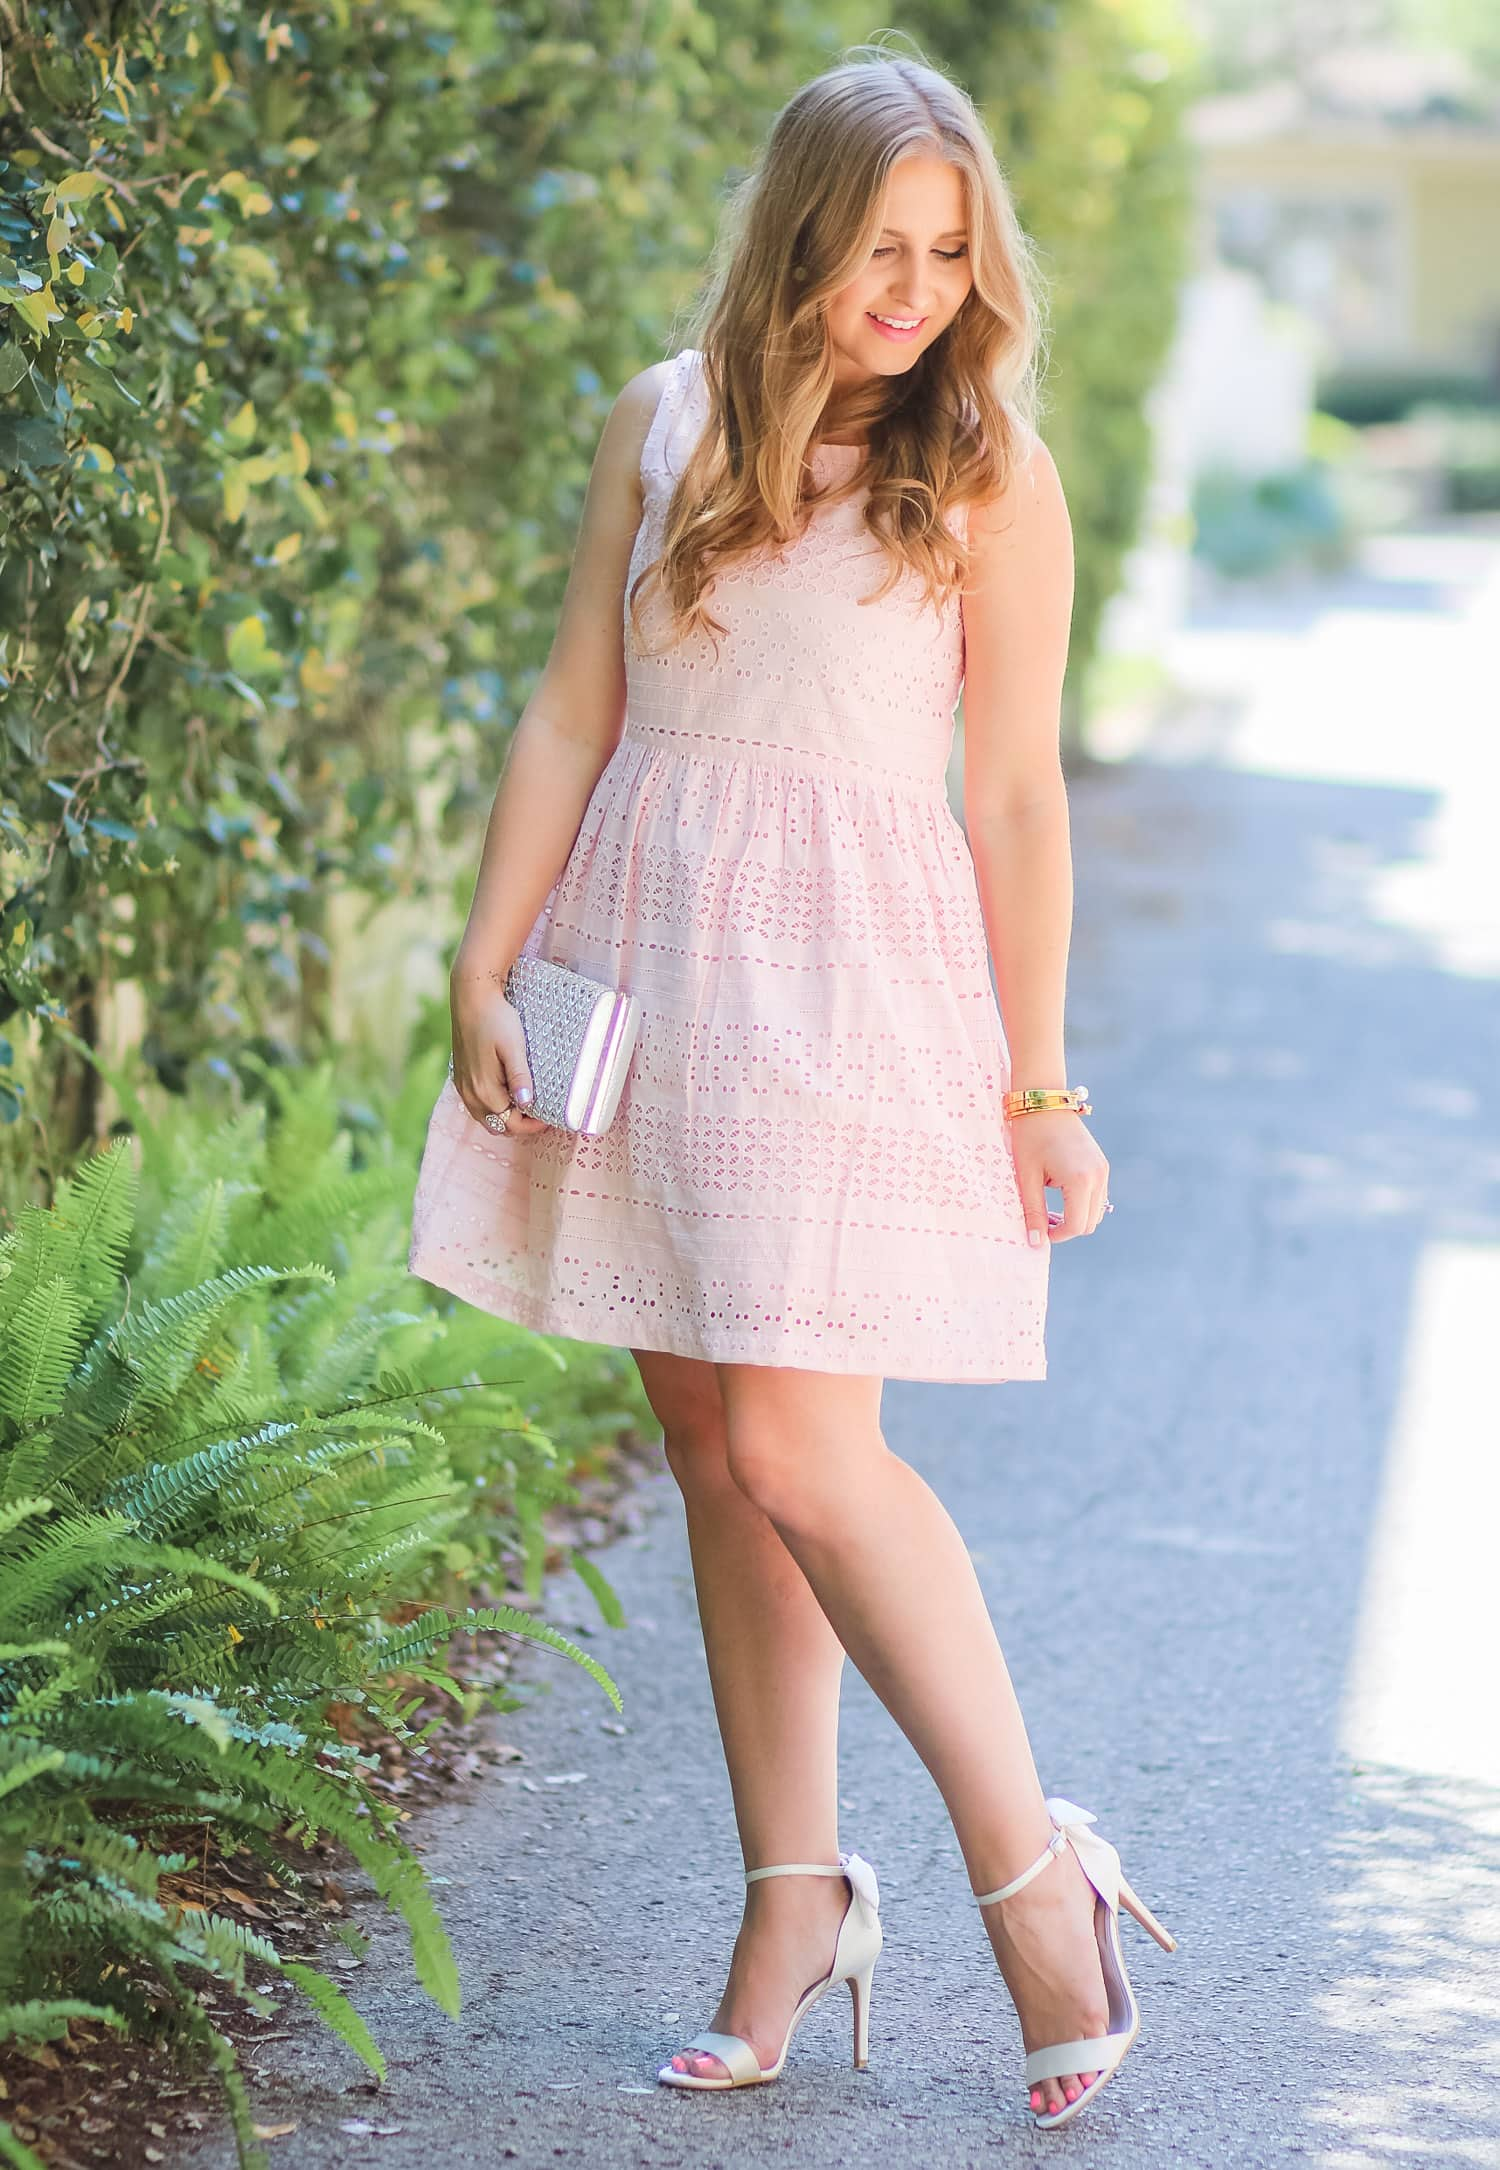 Summer Wedding Guest Outfit Idea